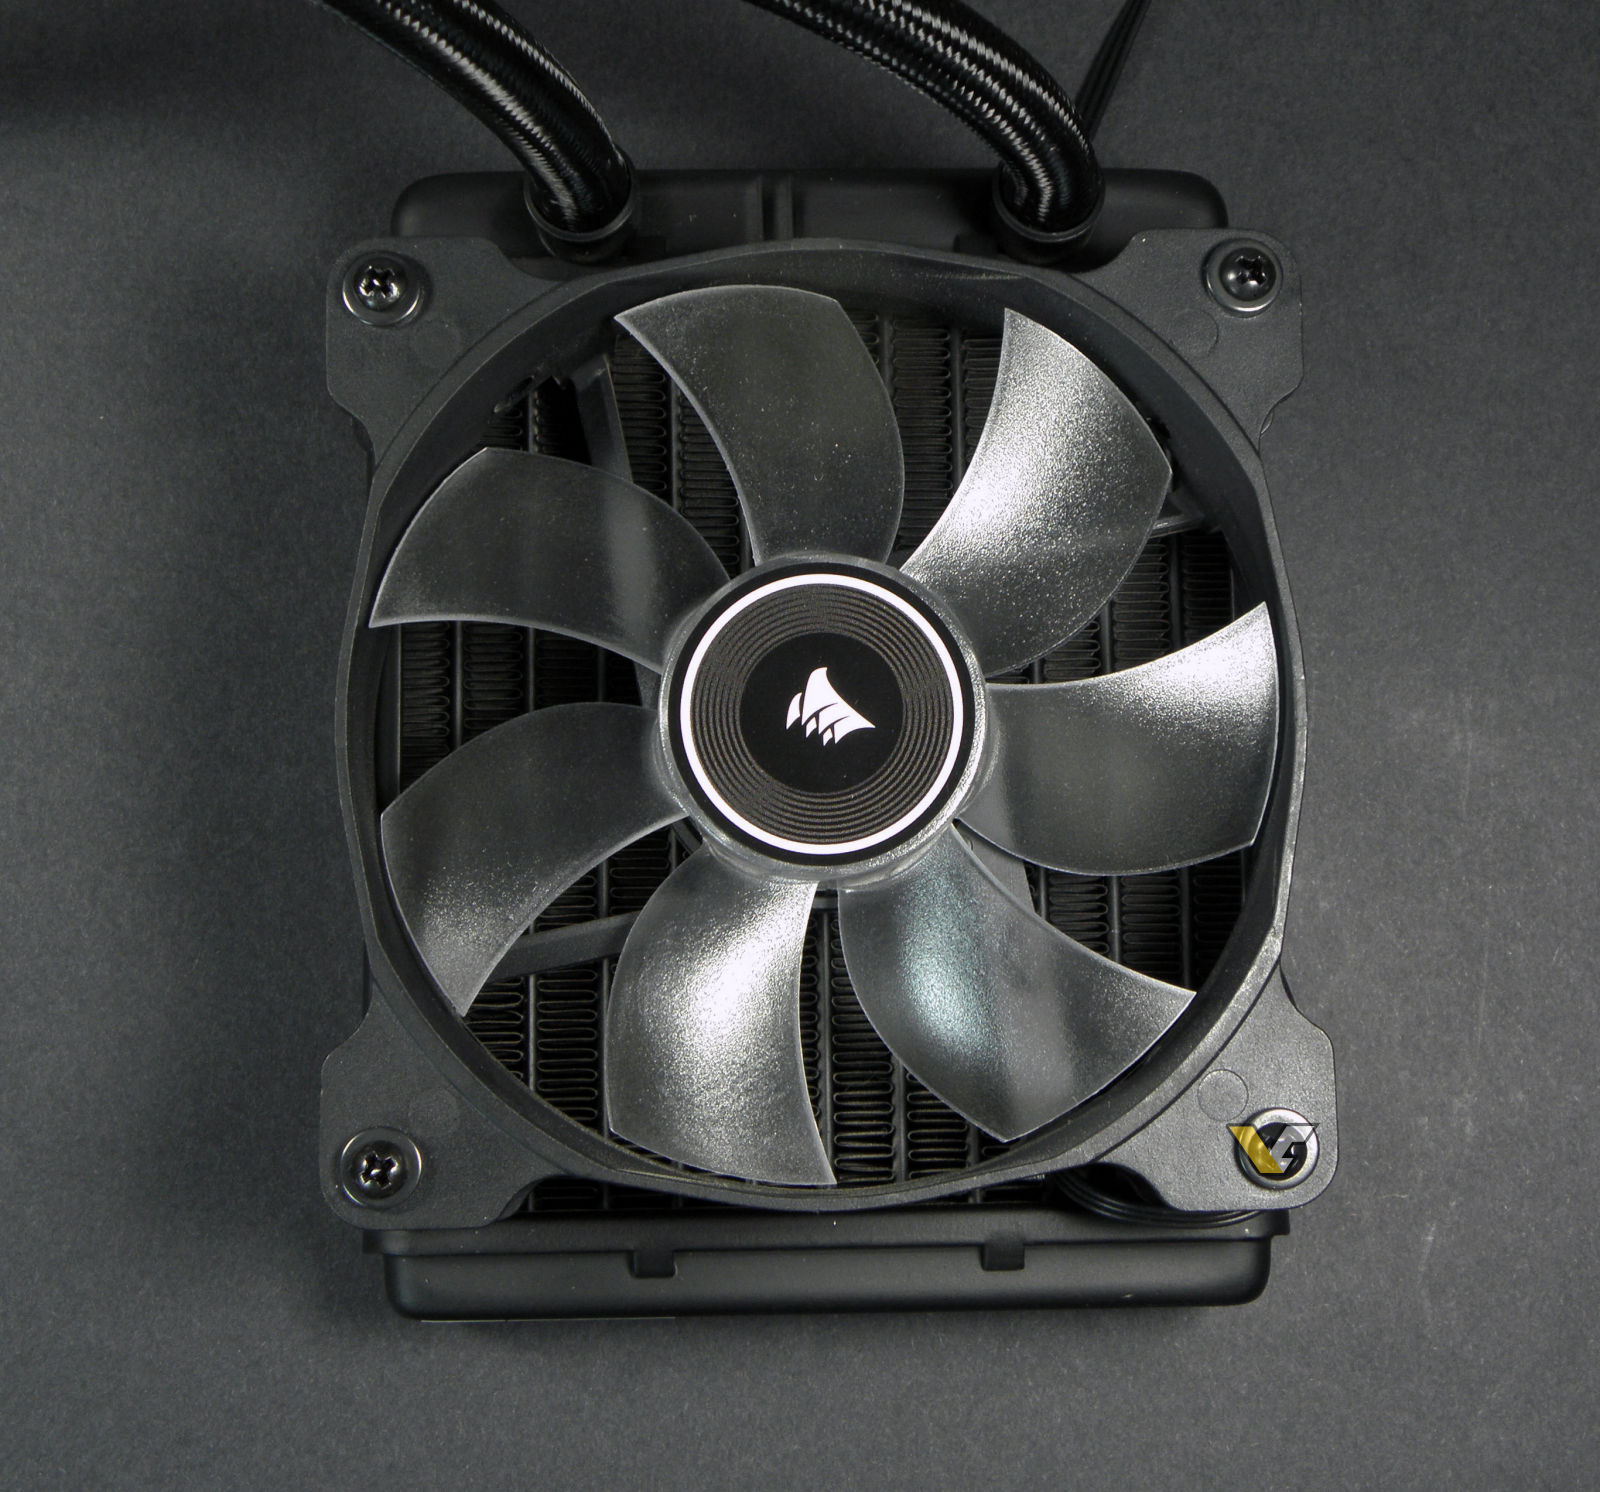 MSI GeForce GTX 1070 SEA HAWK X Review - VideoCardz com